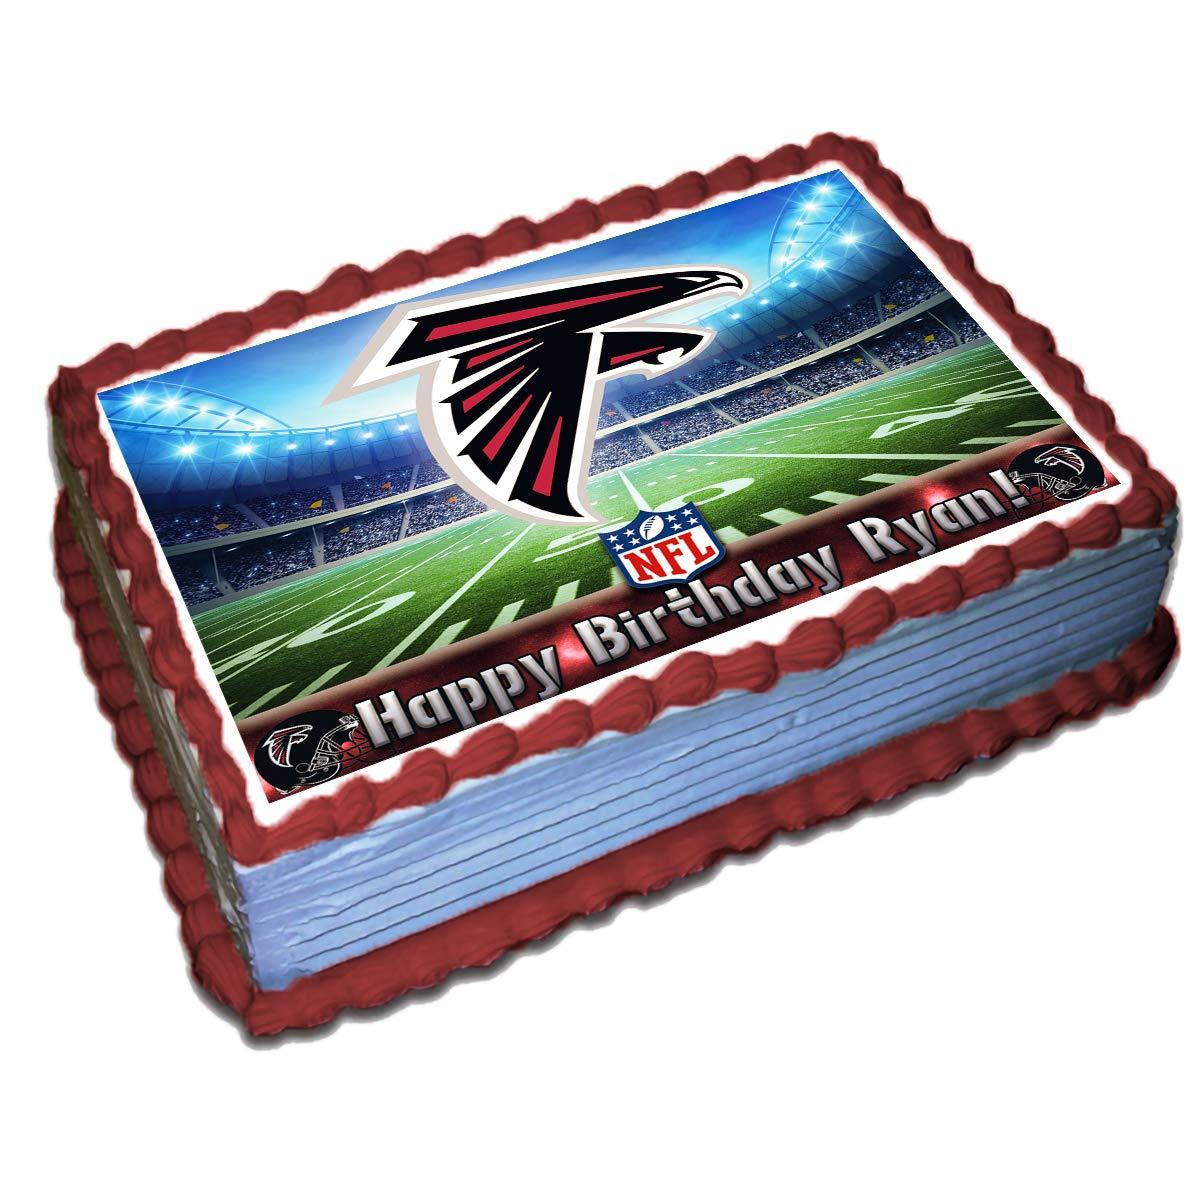 Fantastic Atlanta Falcons Nfl Personalized Cake Topper Icing Sugar Paper 1 4 Personalised Birthday Cards Sponlily Jamesorg